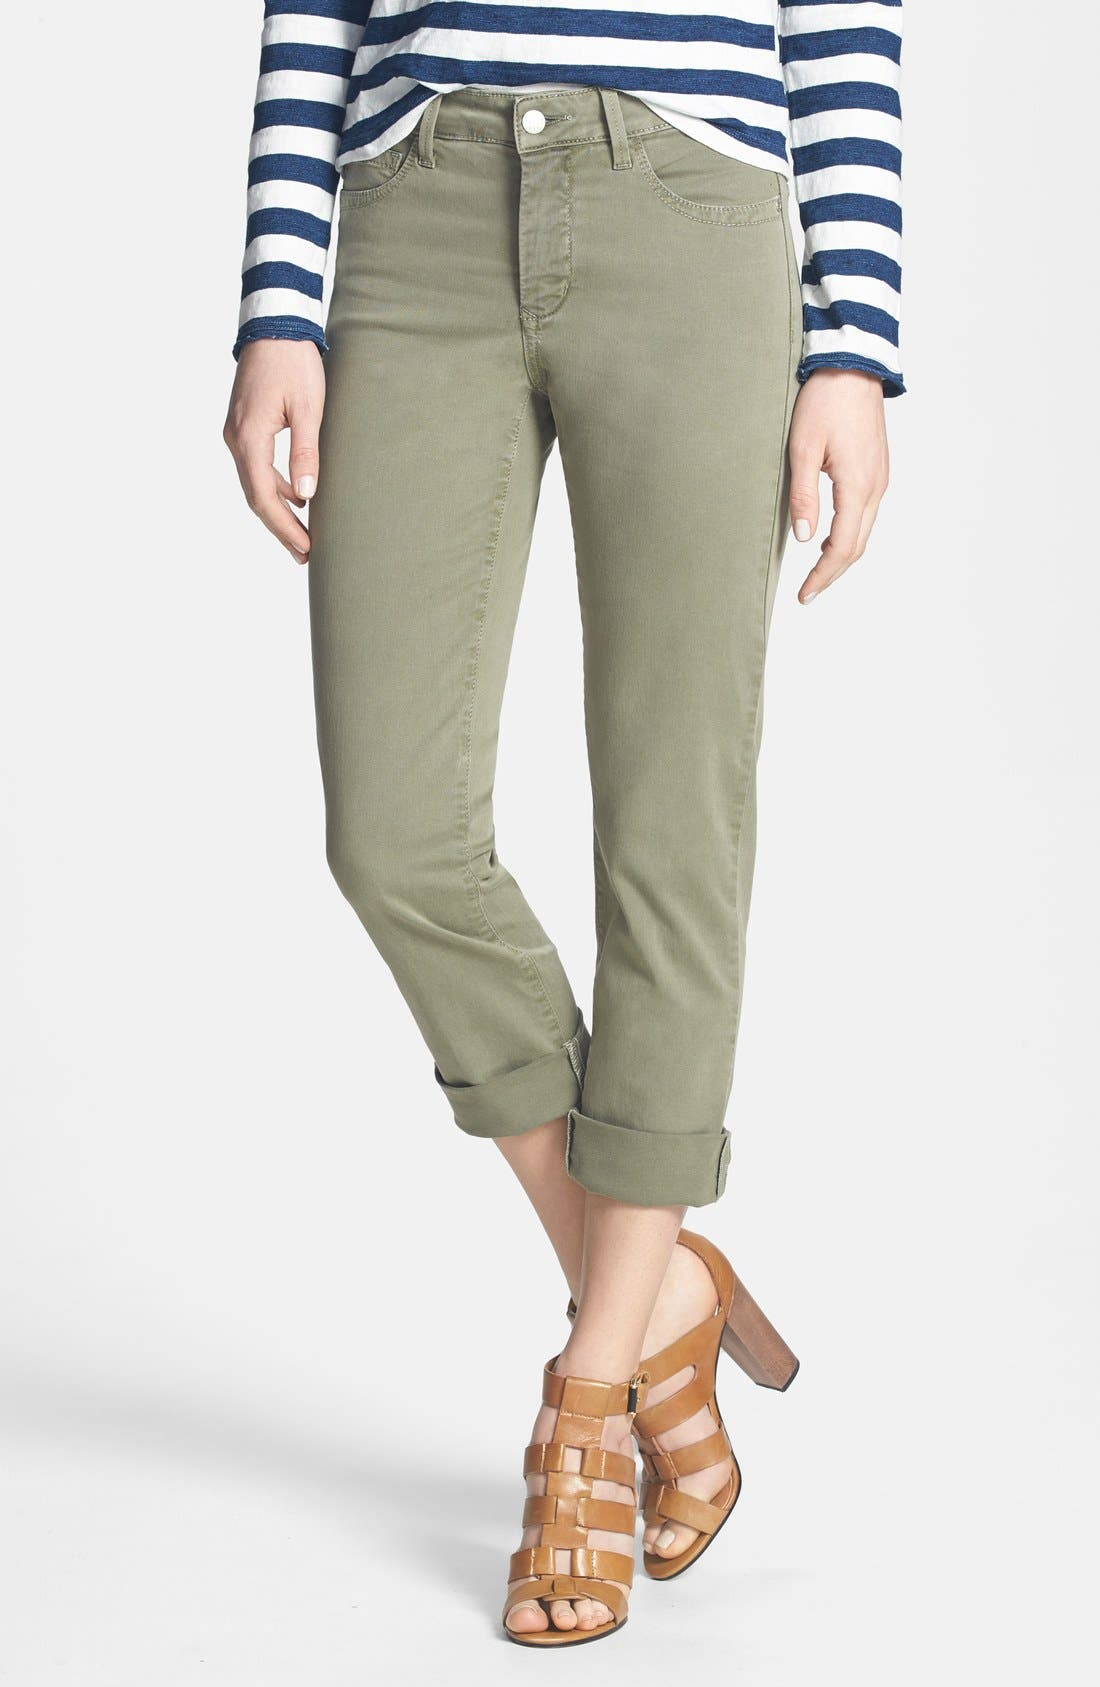 Main Image - NYDJ 'Bobbie' Stretch Boyfriend Jeans (Fennel) (Regular & Petite)